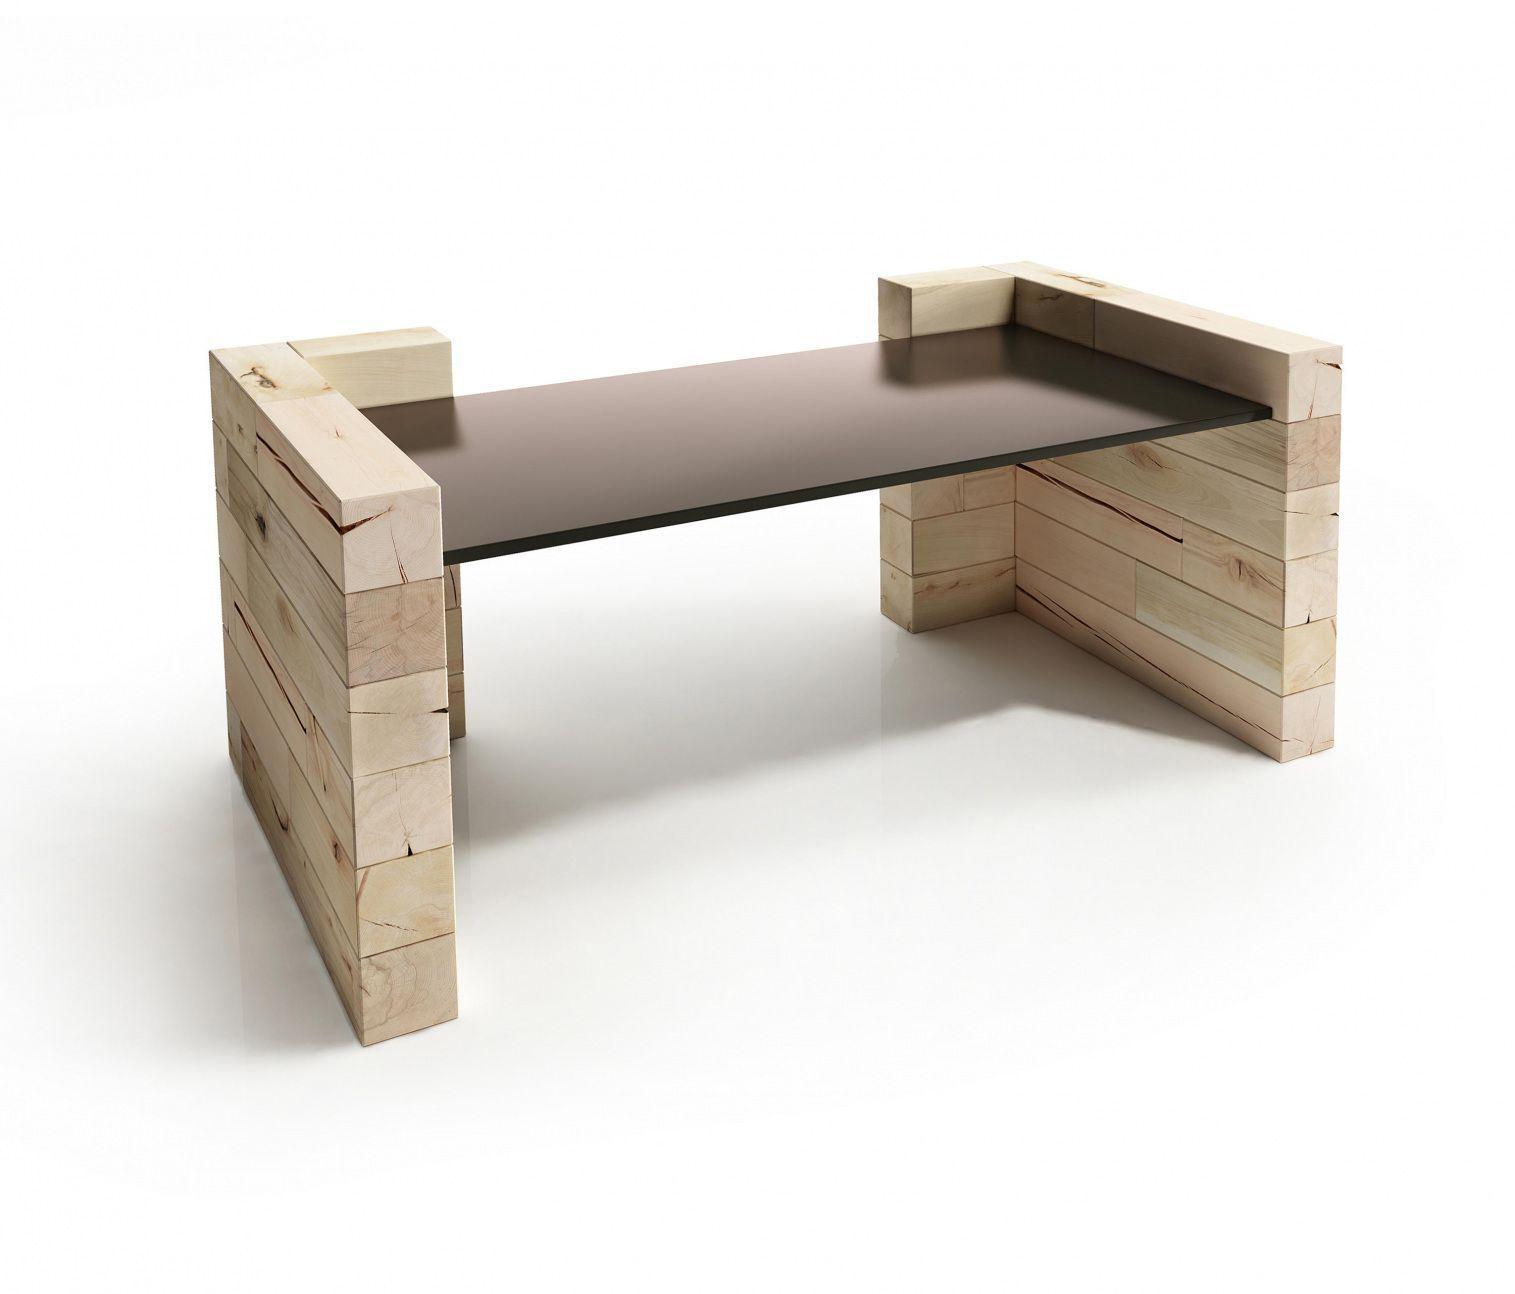 Design fice Desk Real Wood Home fice Furniture Check more at